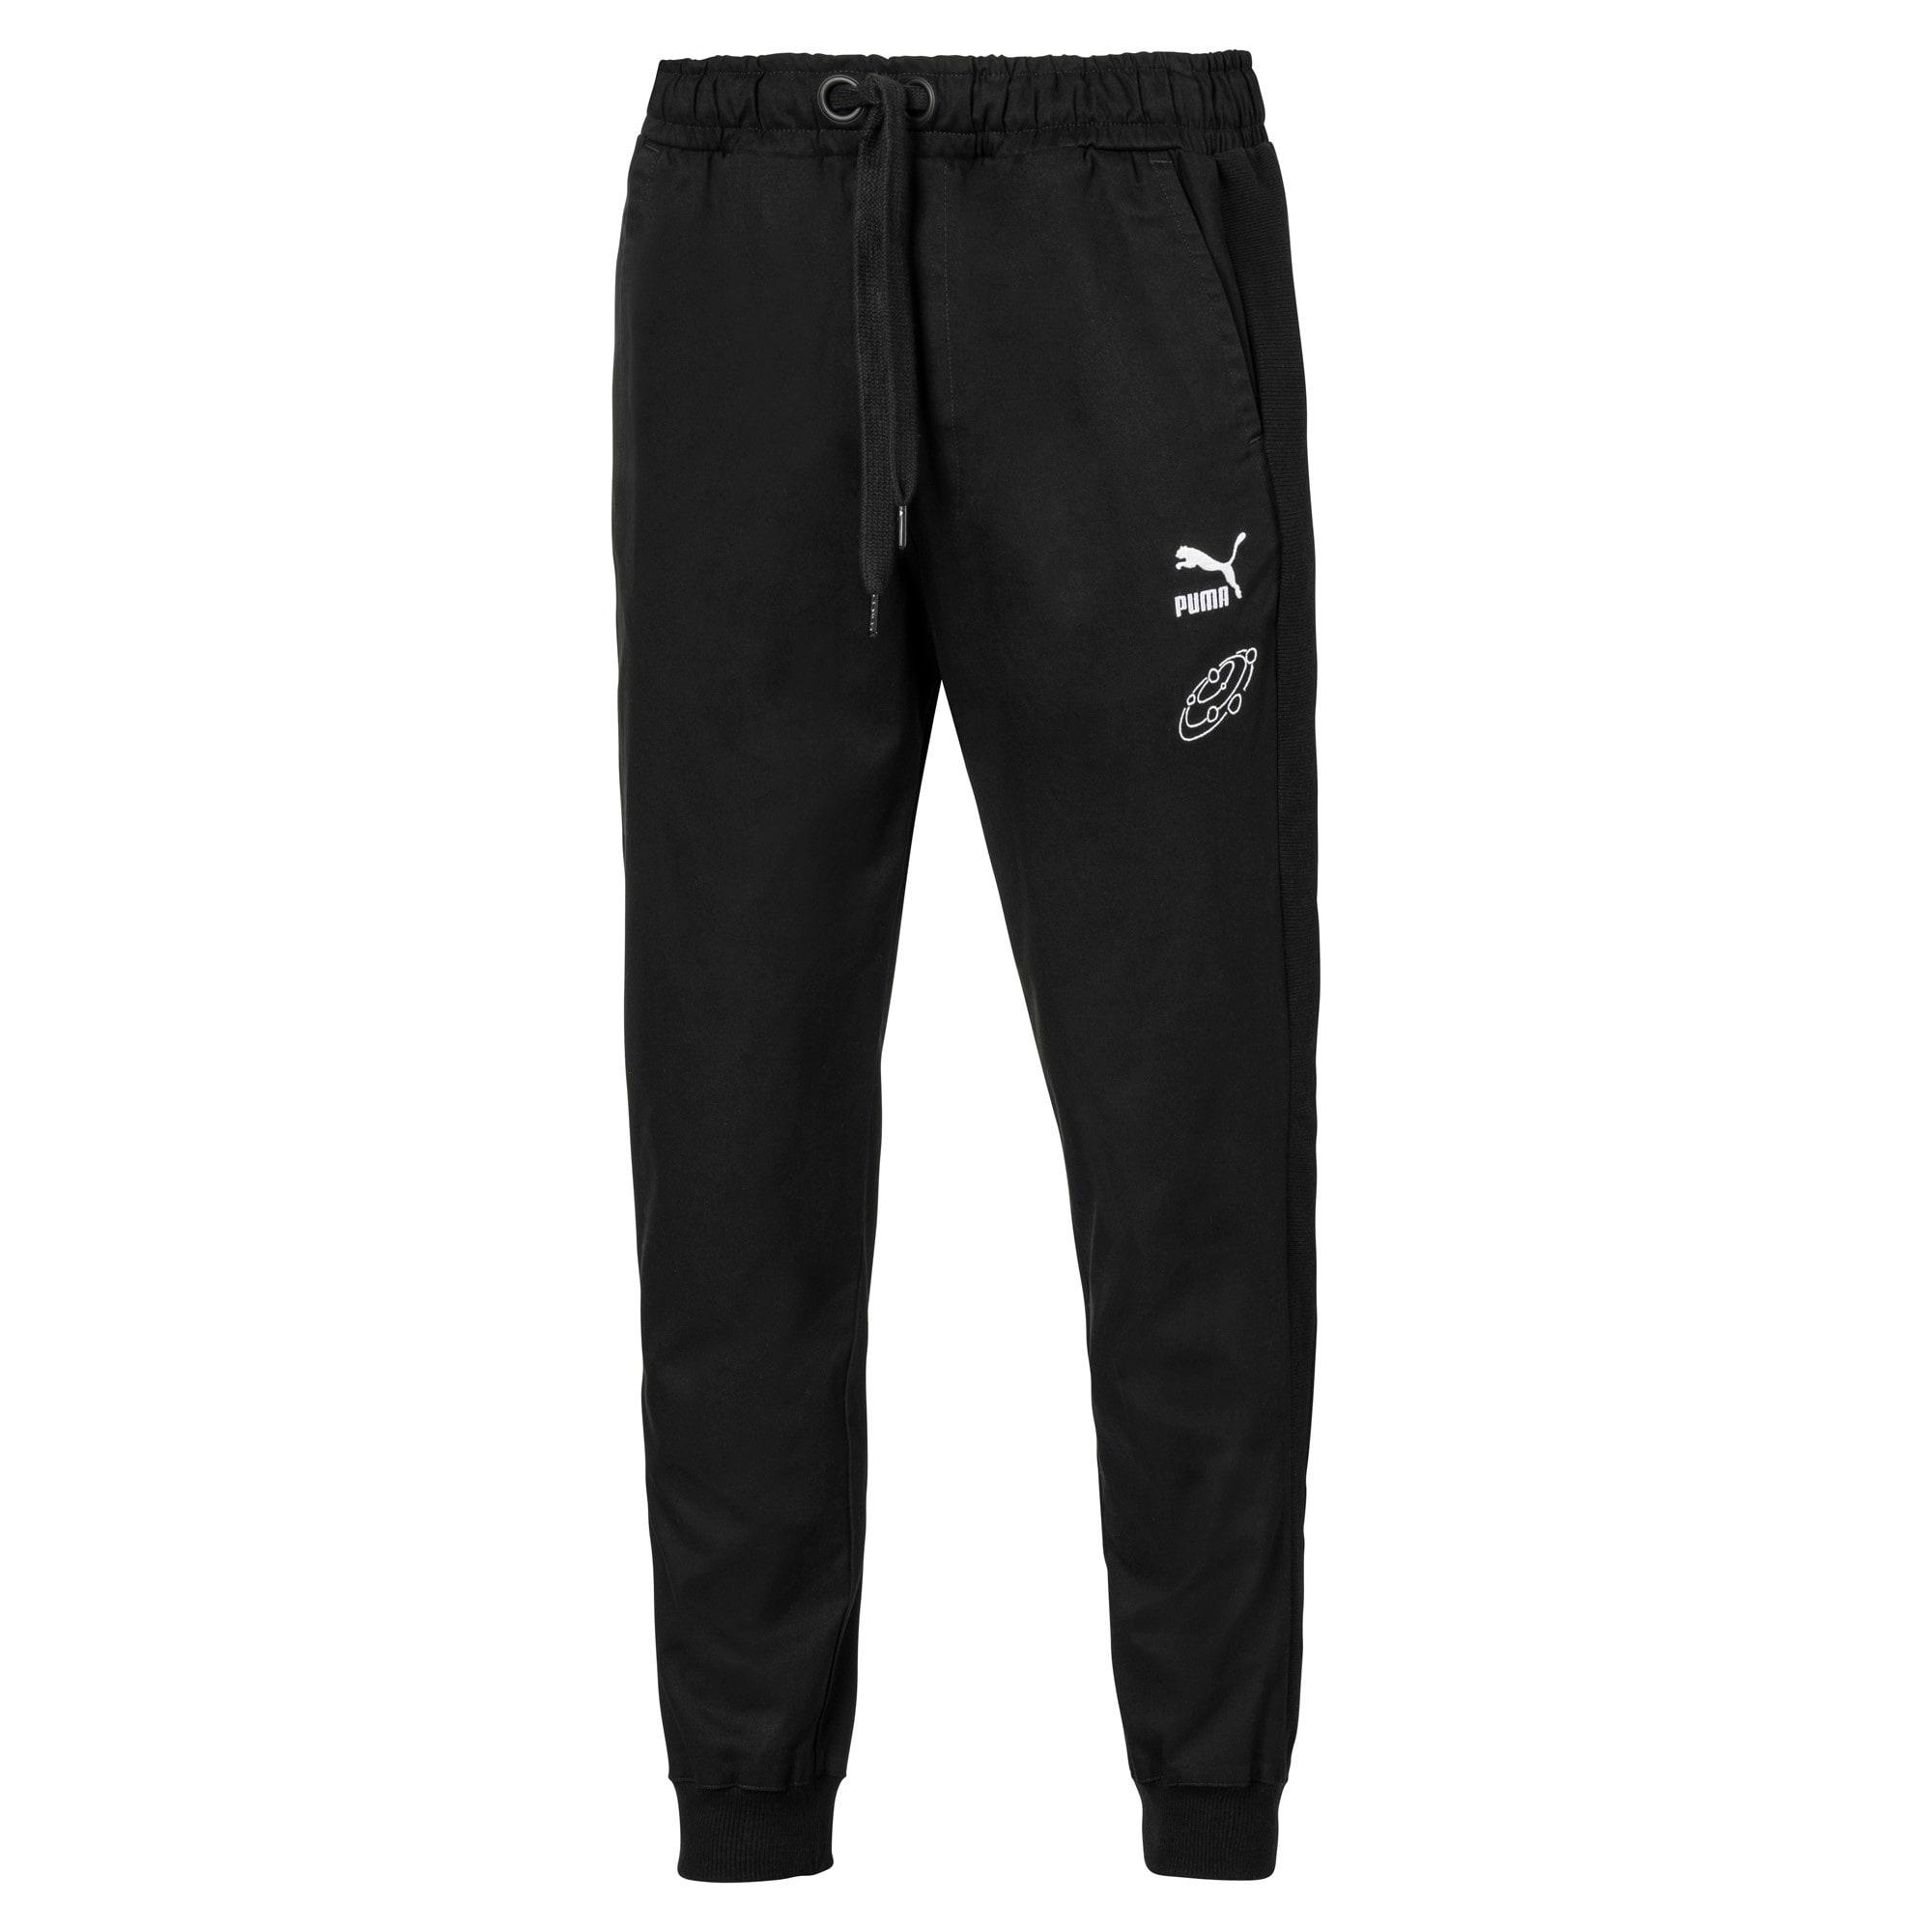 Thumbnail 1 of PUMA x TYAKASHA Men's Track Pants, Cotton Black, medium